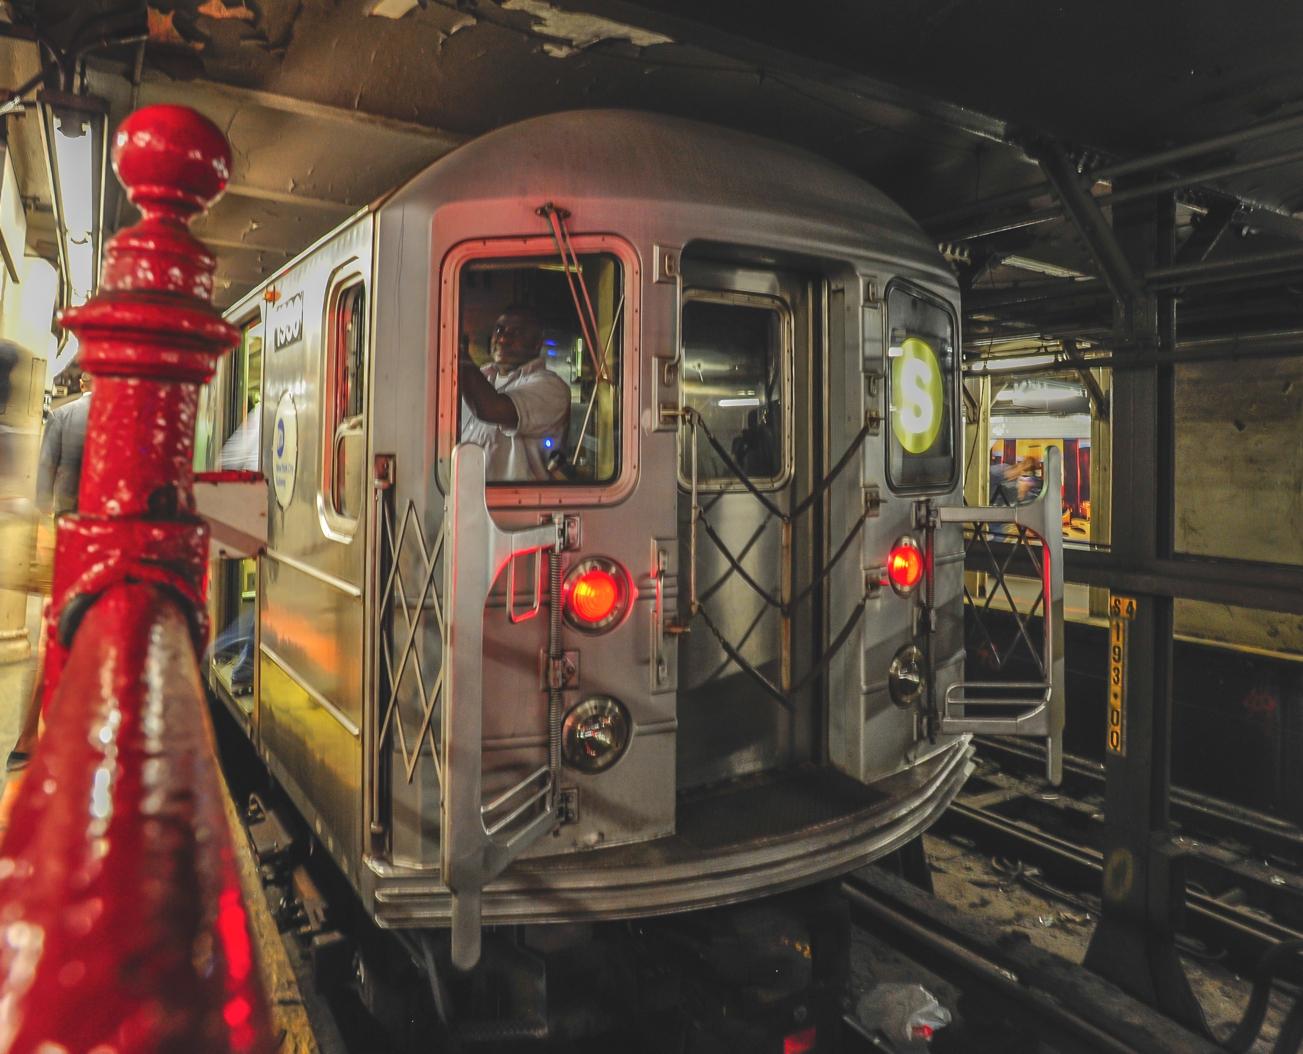 Shuttle Train am Time Square